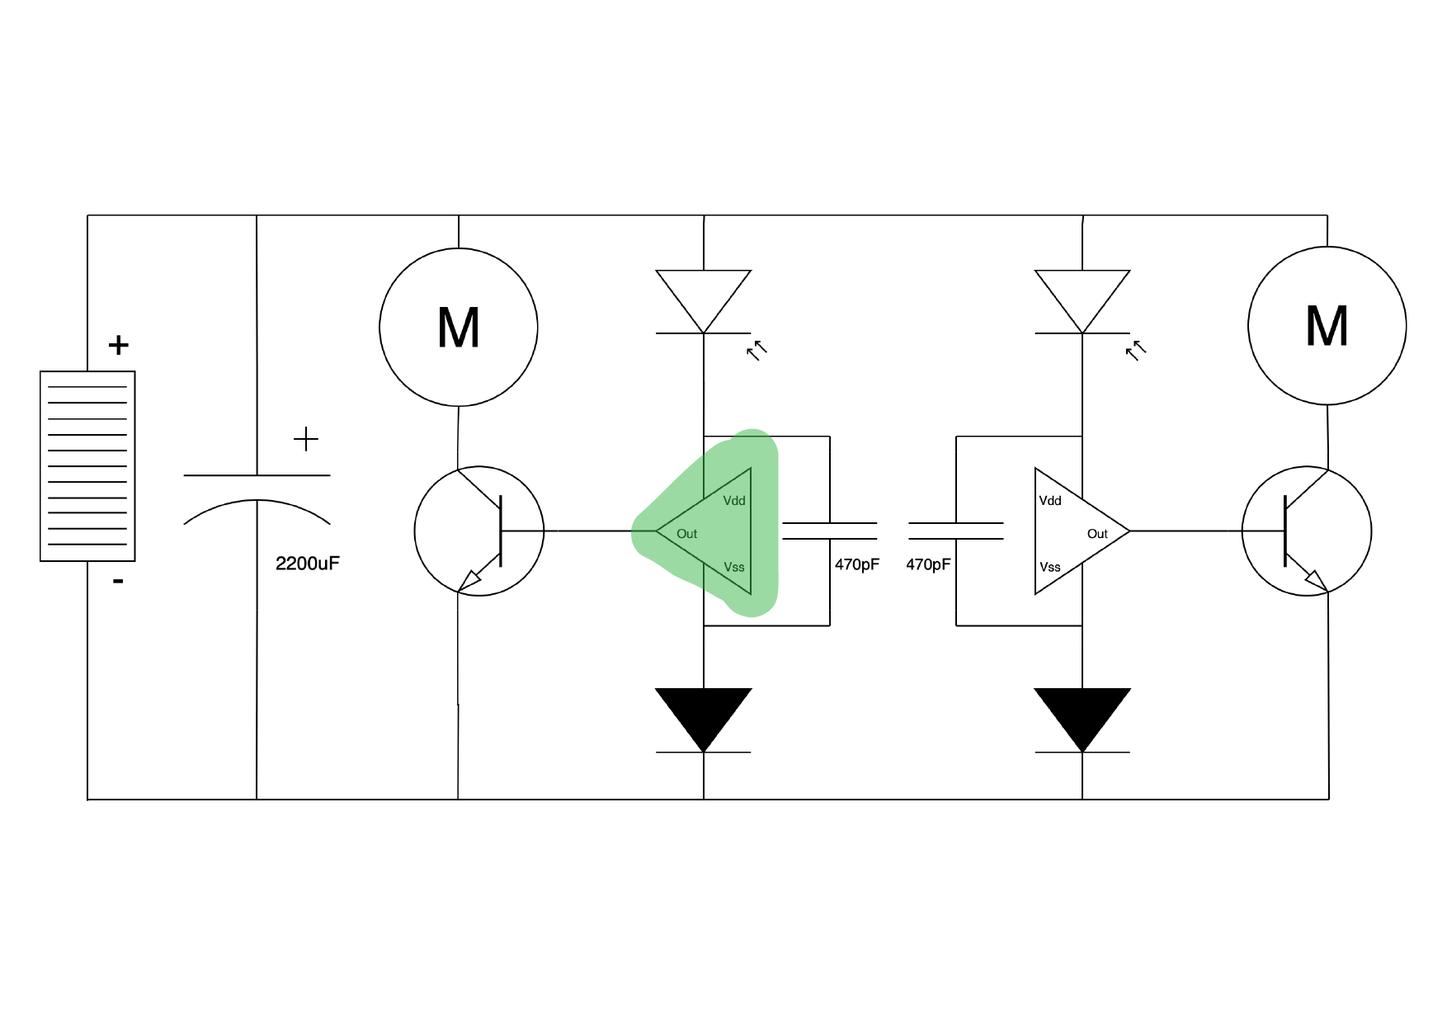 Freeforming the Circuit 1: MCP112 190